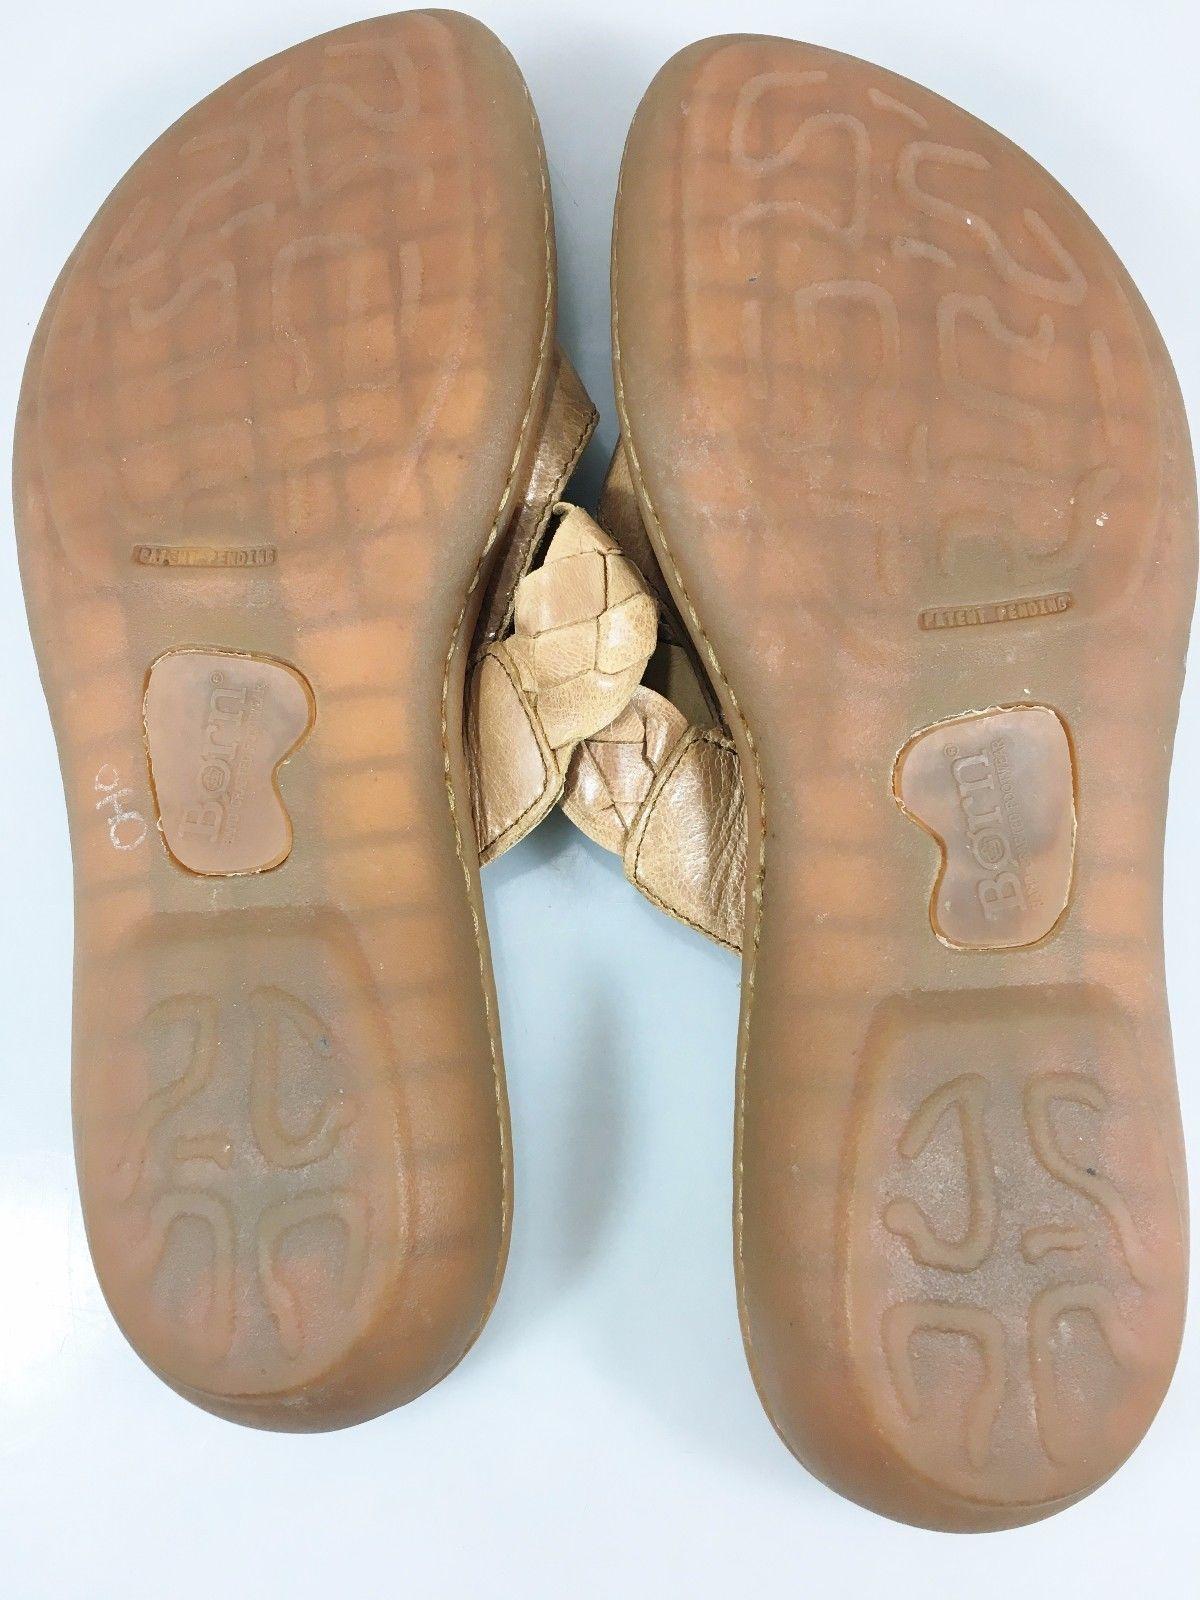 Born Womens 8 US 39EU Beige Leather Woven Strap Flat Sandals